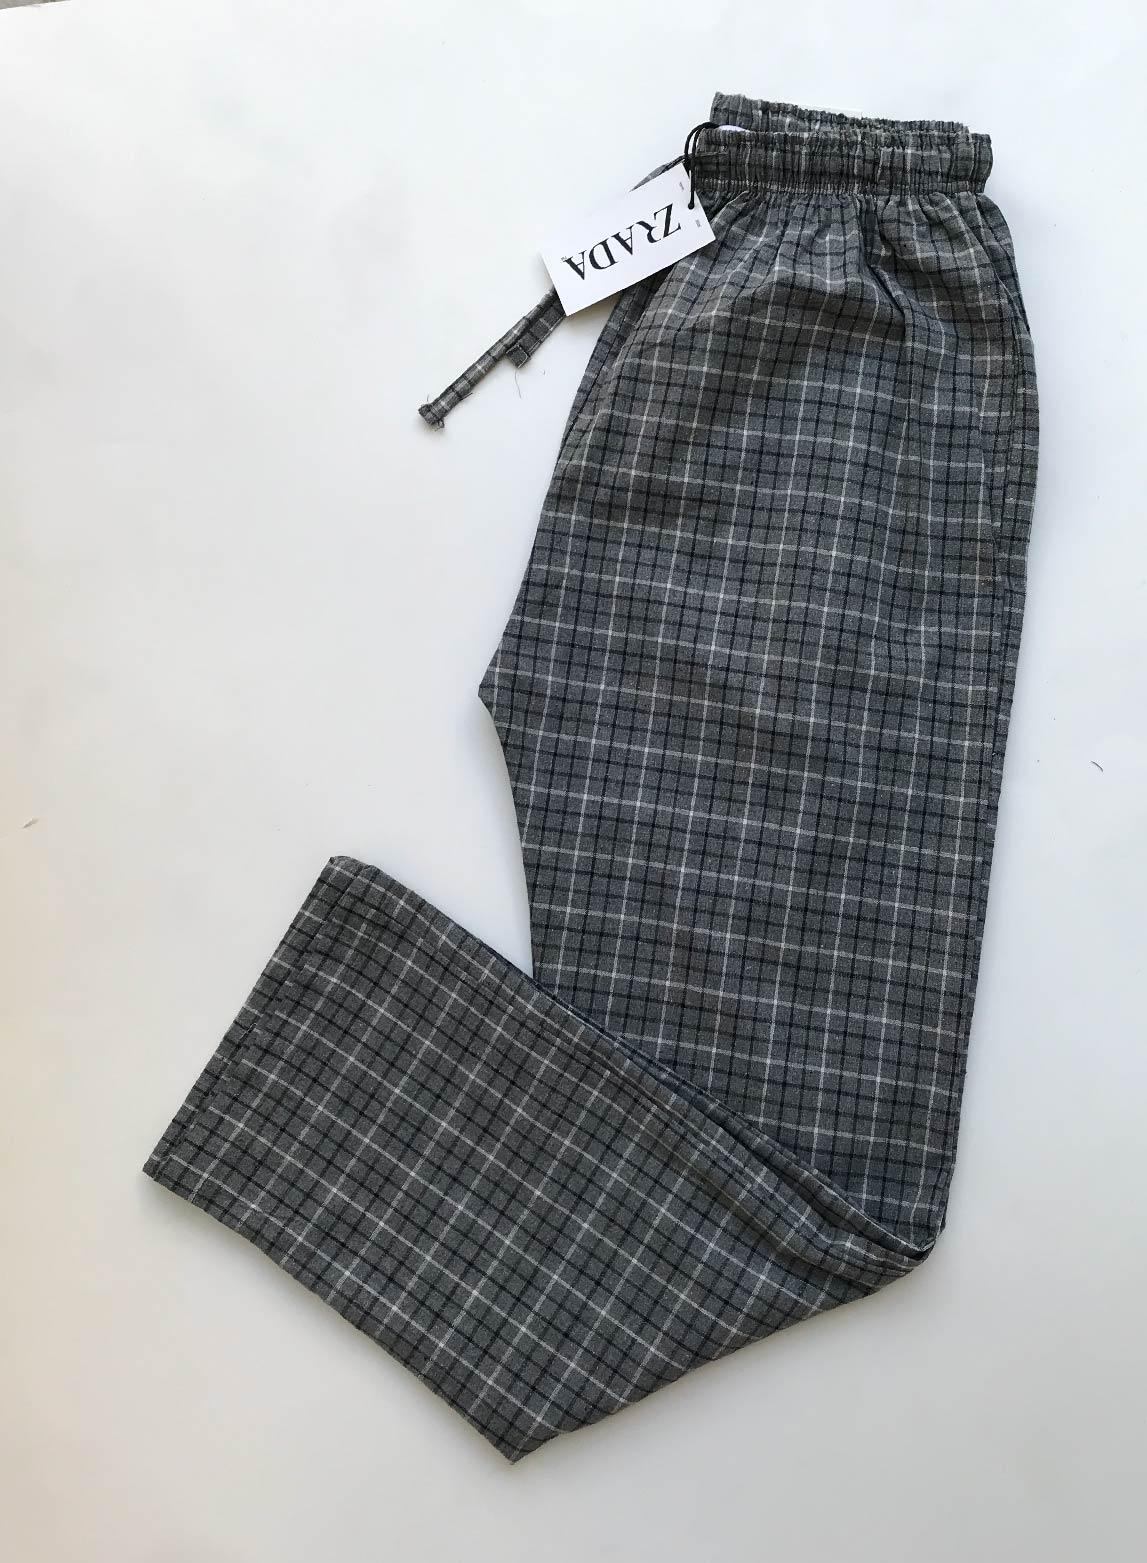 The Factory Stock - 100% Cotton Men's Loungewear